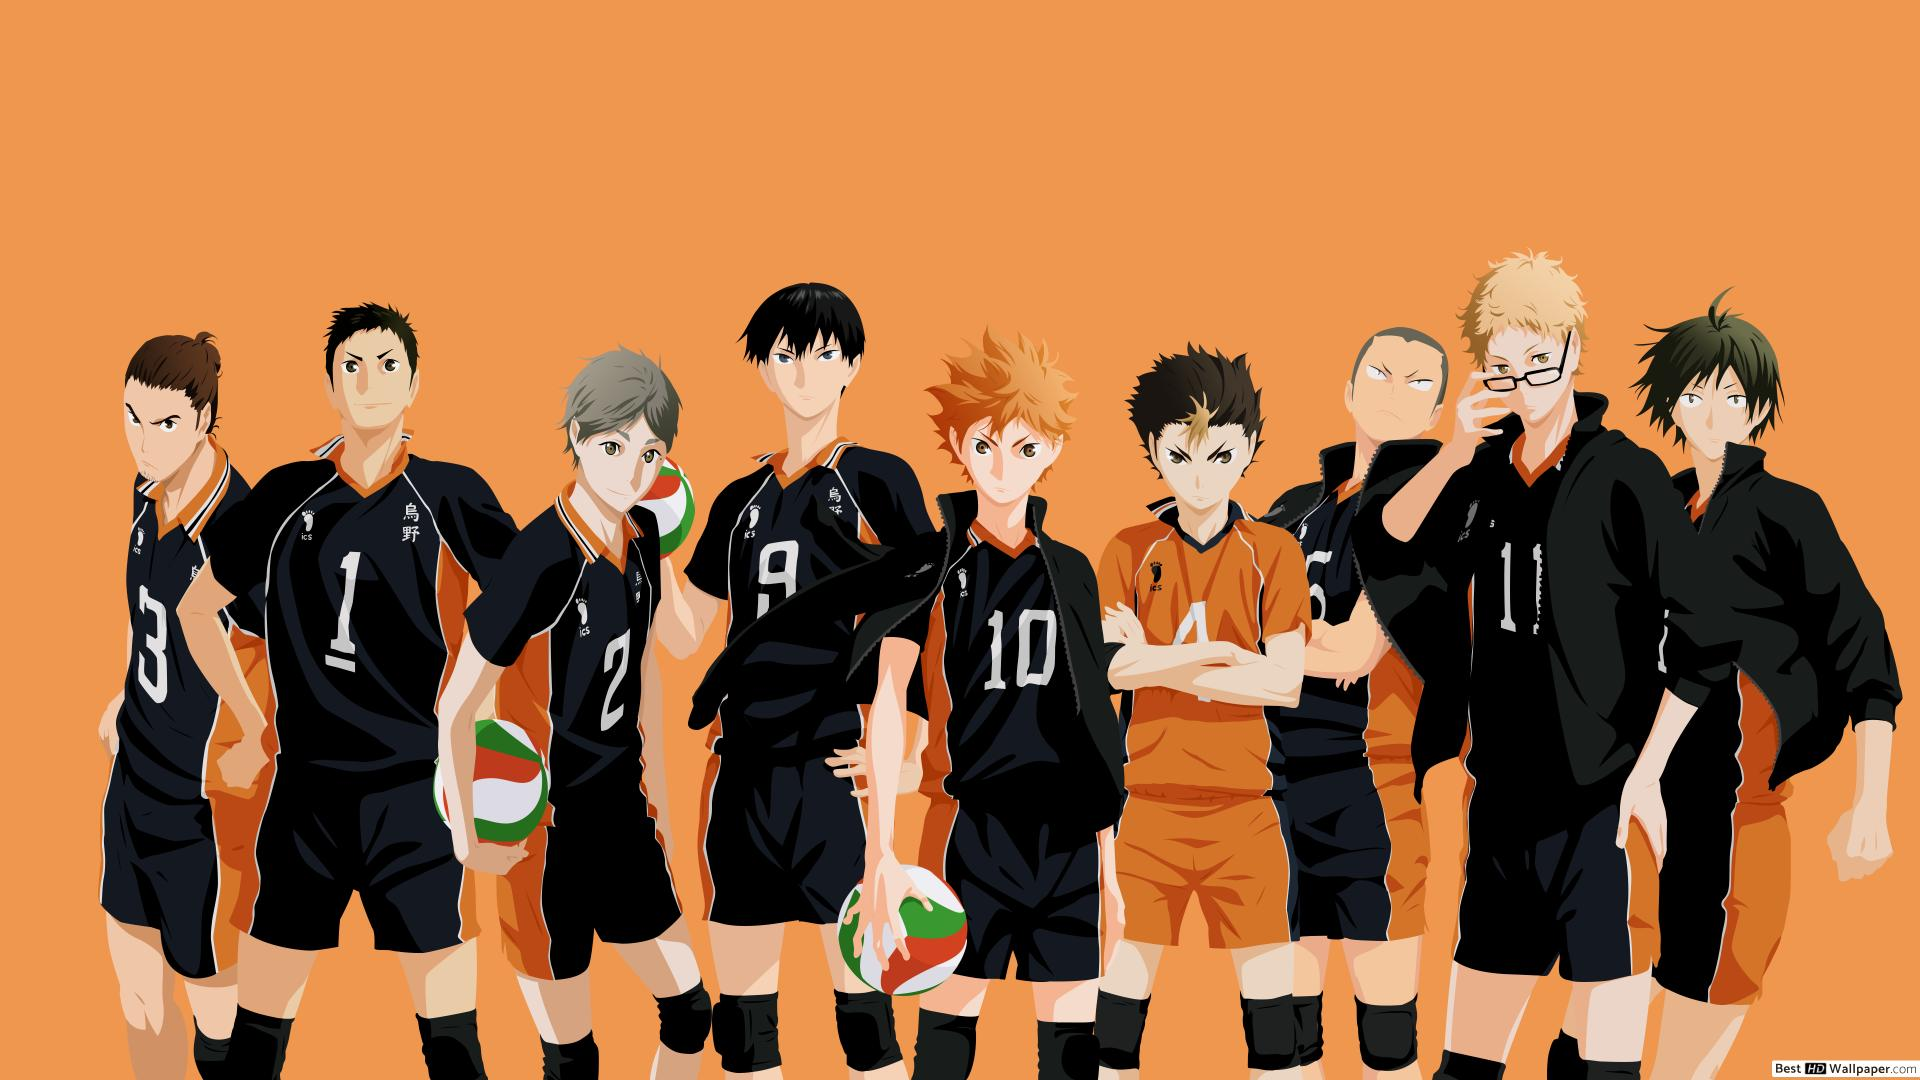 Haikyuu   Karasuno Team HD wallpaper download 1920x1080